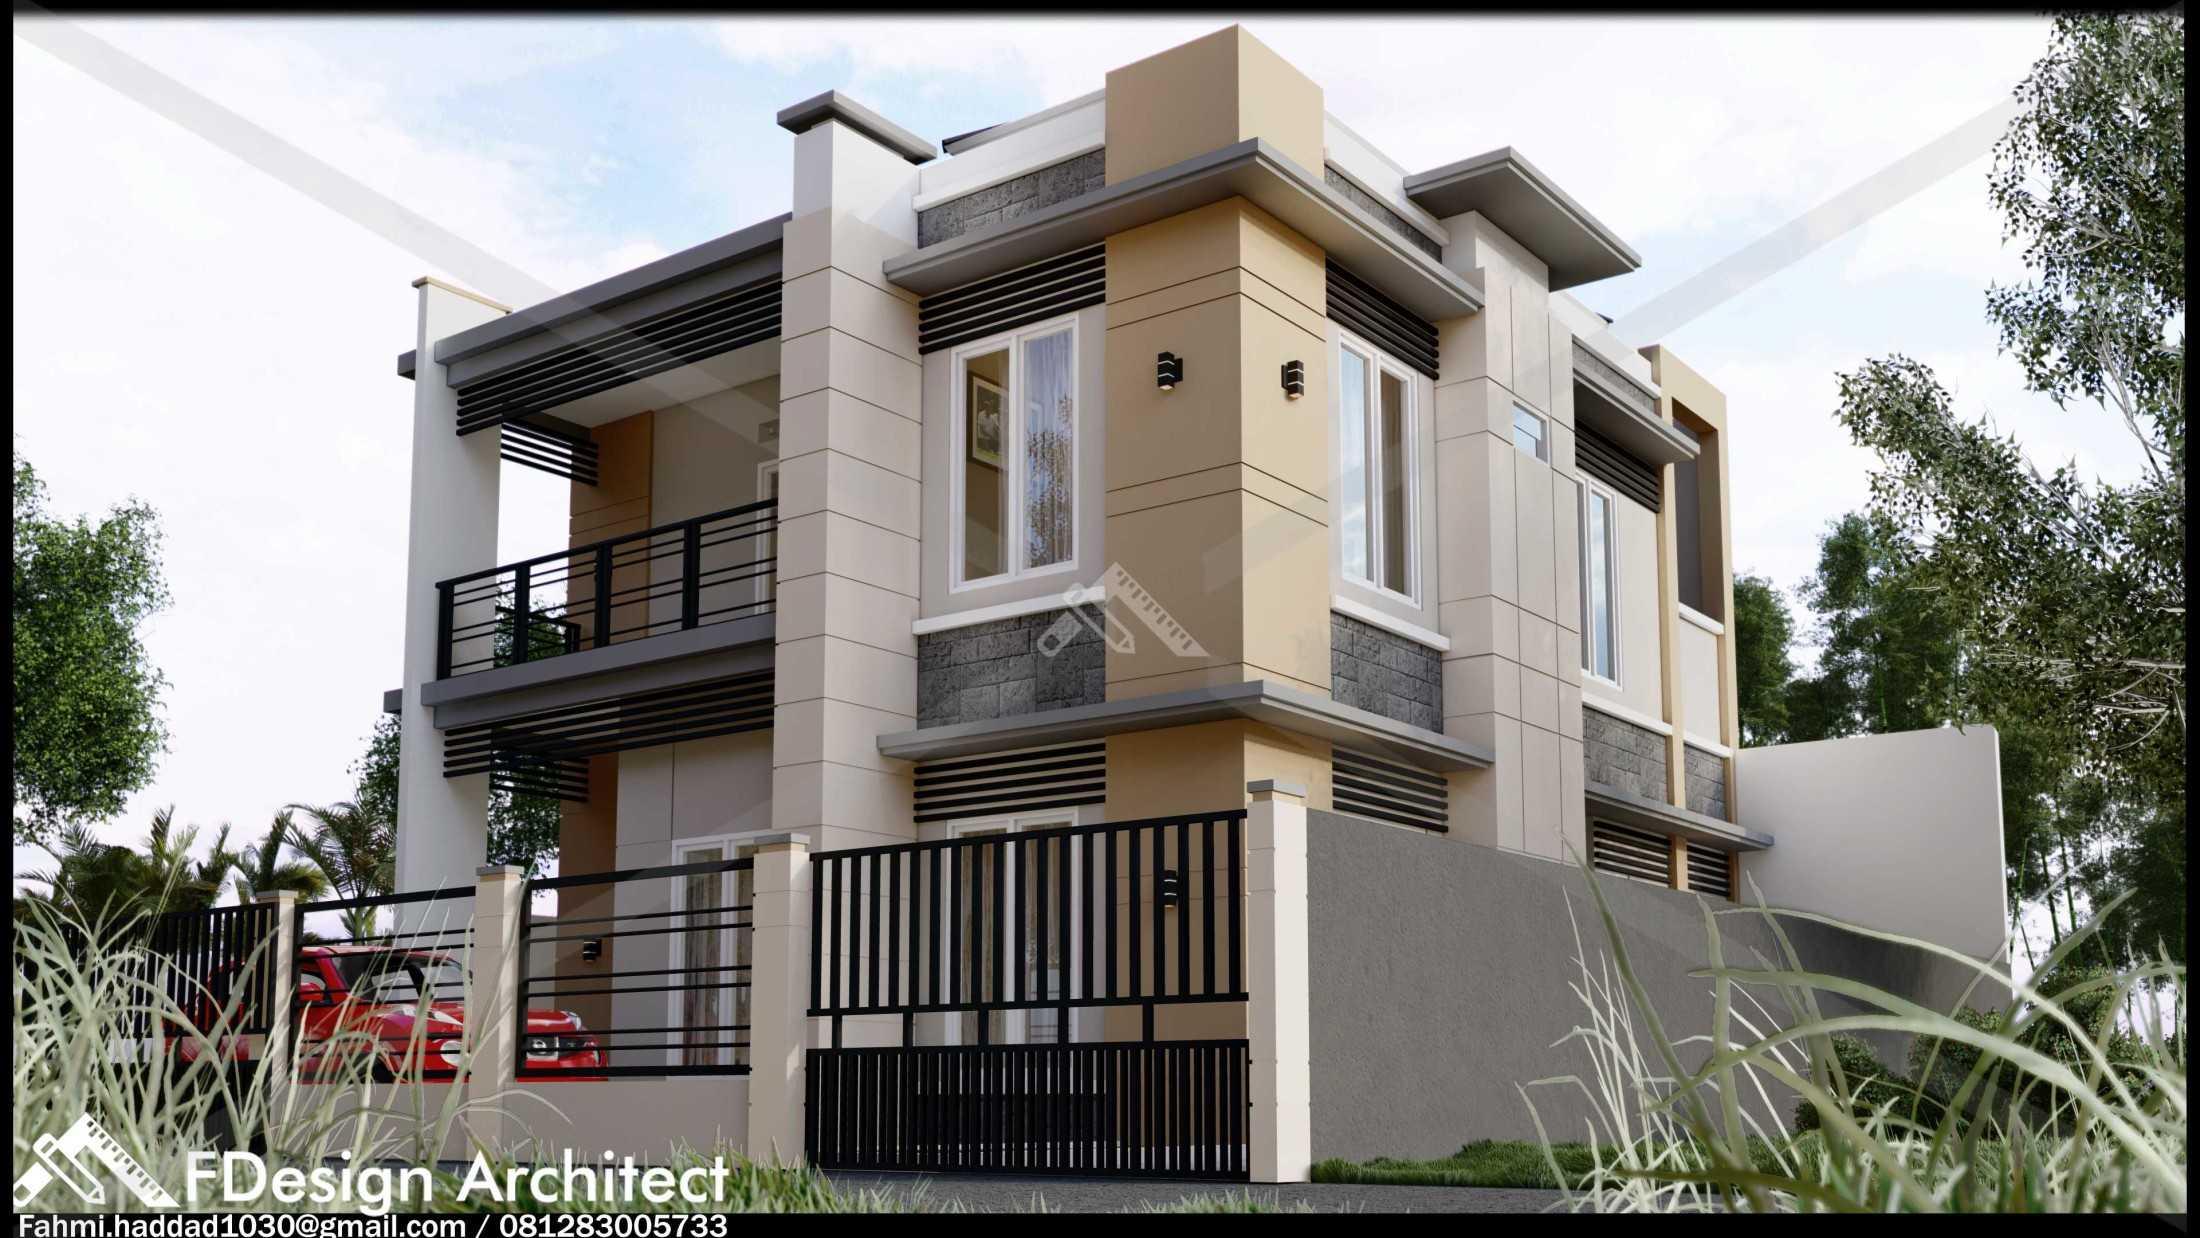 Fdesign Architect Pamulang House Pamulang, Kota Tangerang Selatan, Banten, Indonesia Pamulang, Kota Tangerang Selatan, Banten, Indonesia Fdesign-Architect-Pamulang-House  74945